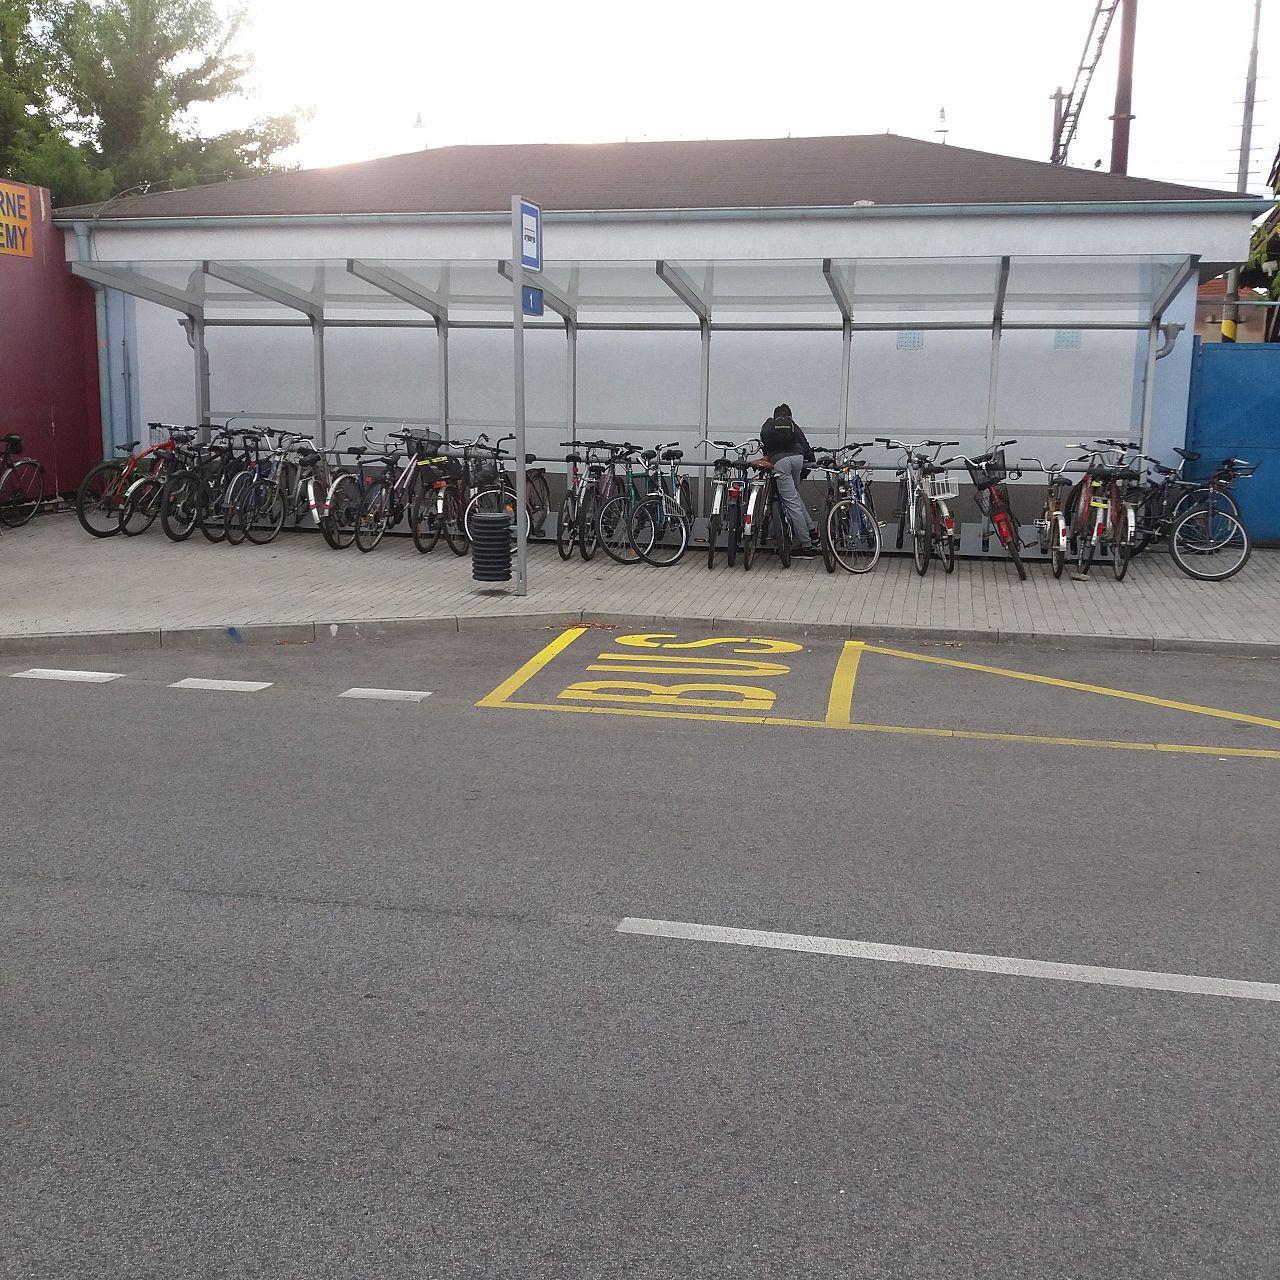 525f6798c Chýbajúce cyklostojany na stanici, , Malacky | Odkazprestarostu.sk